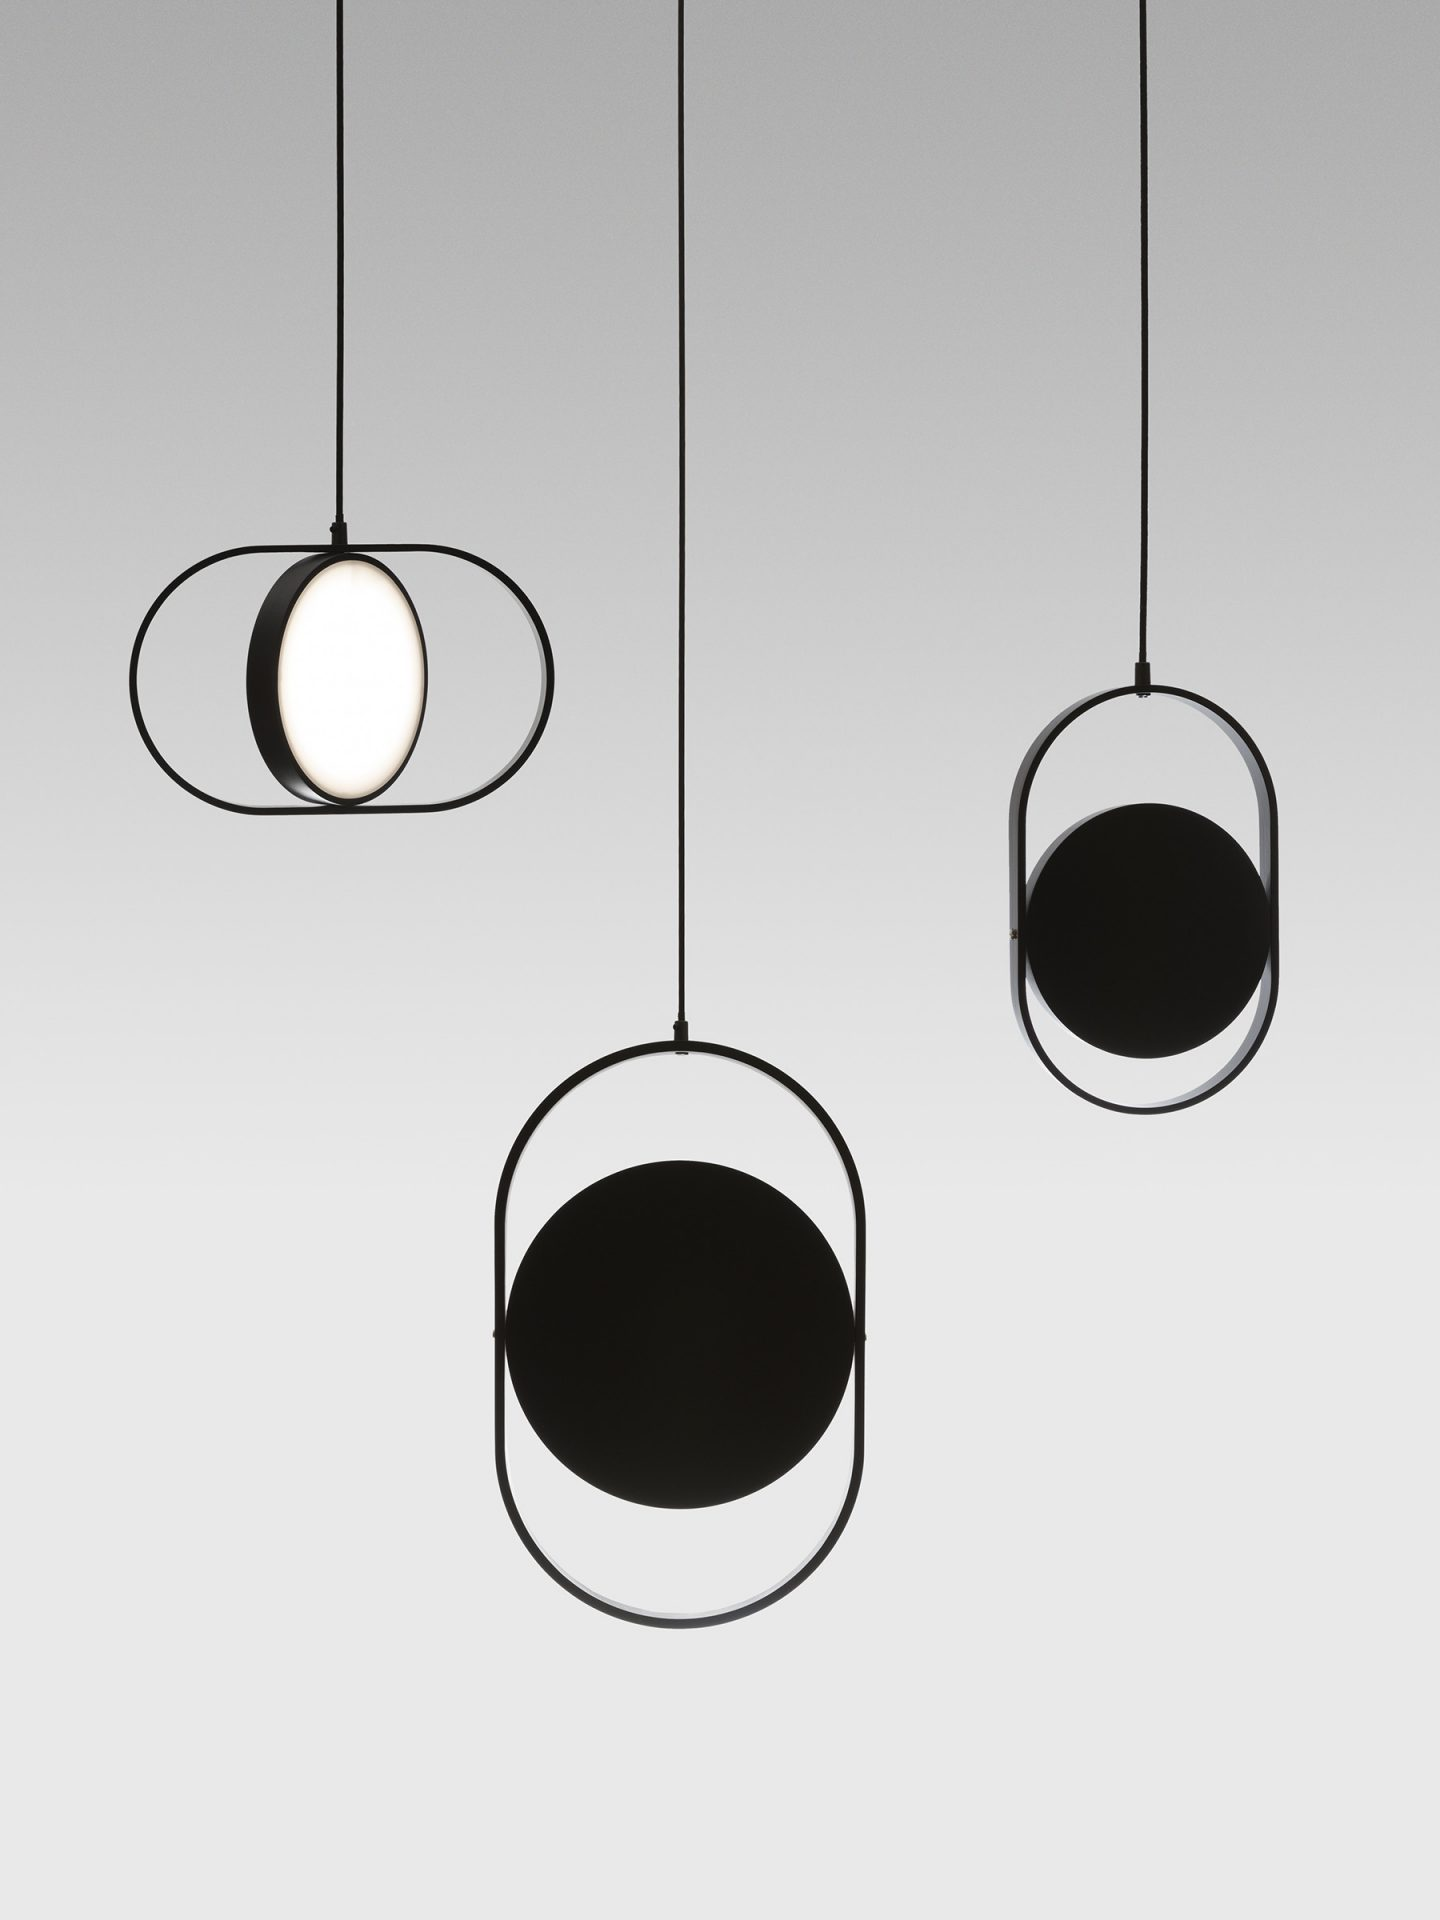 iGNANT-Design-Elina-Ulvio-KUU-01